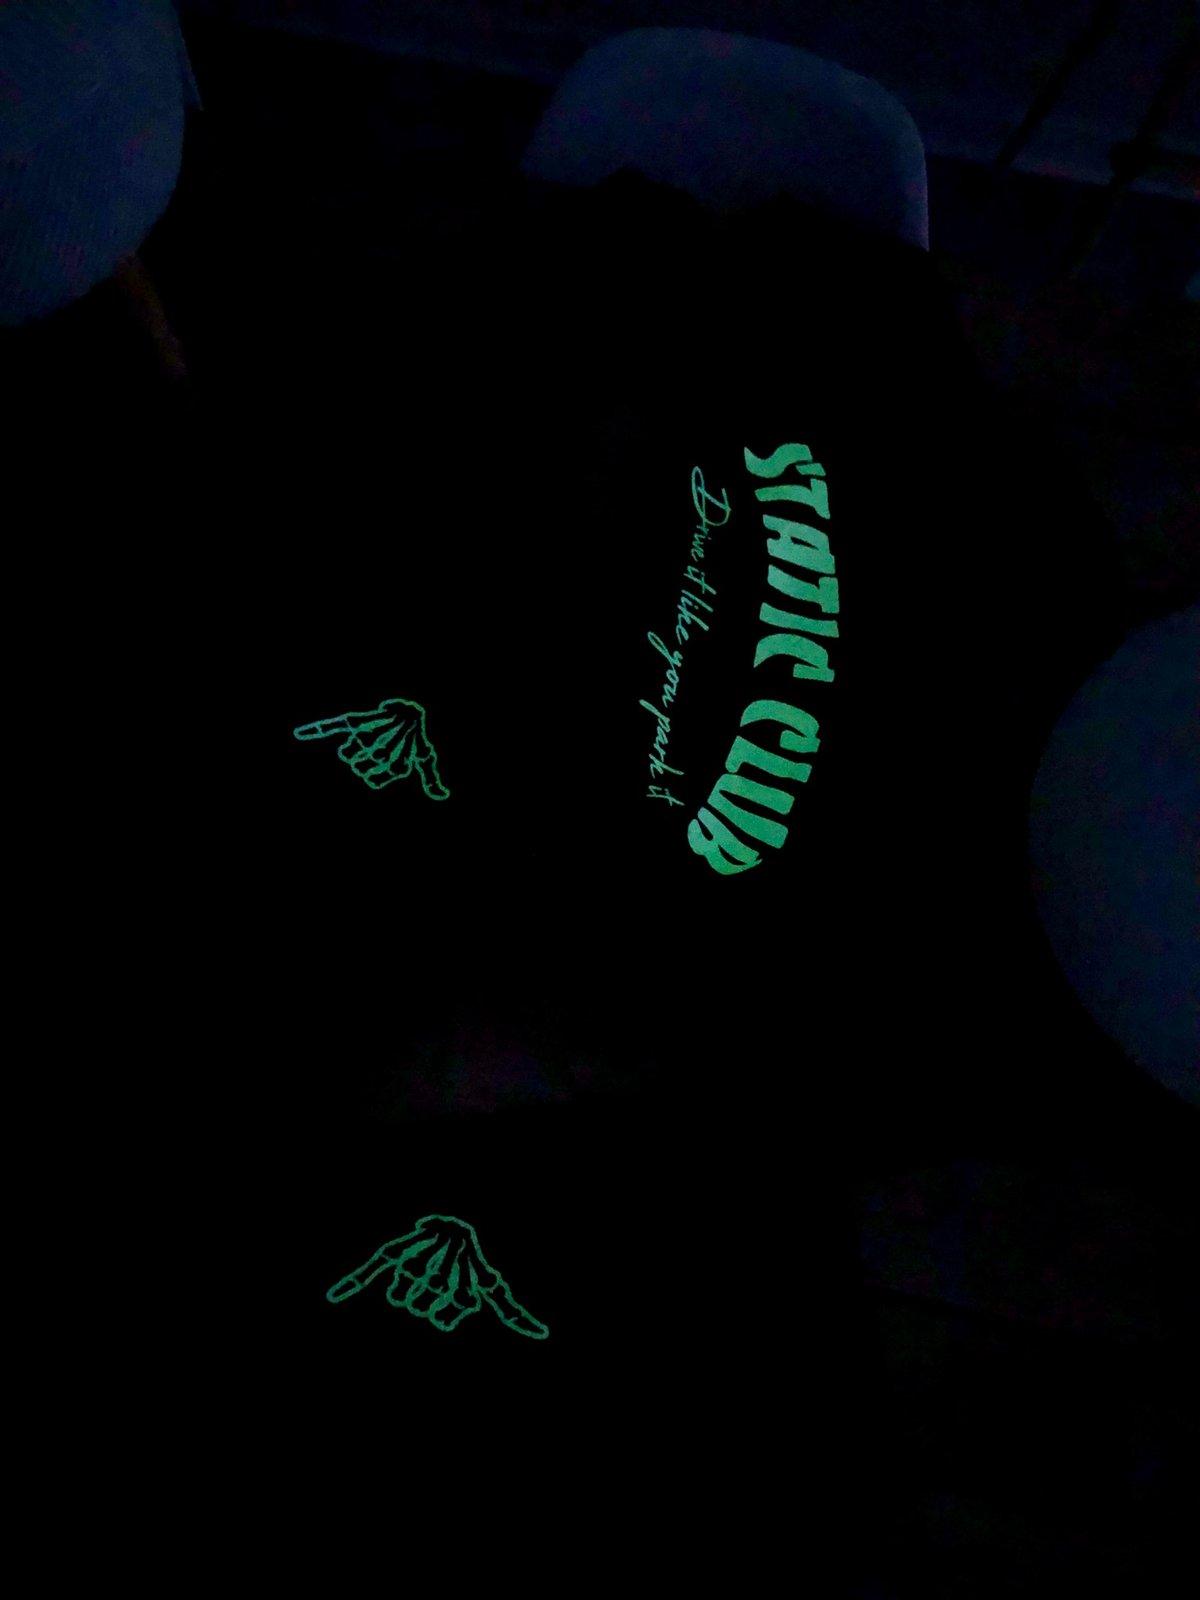 Glow in the dark Champion Shorts